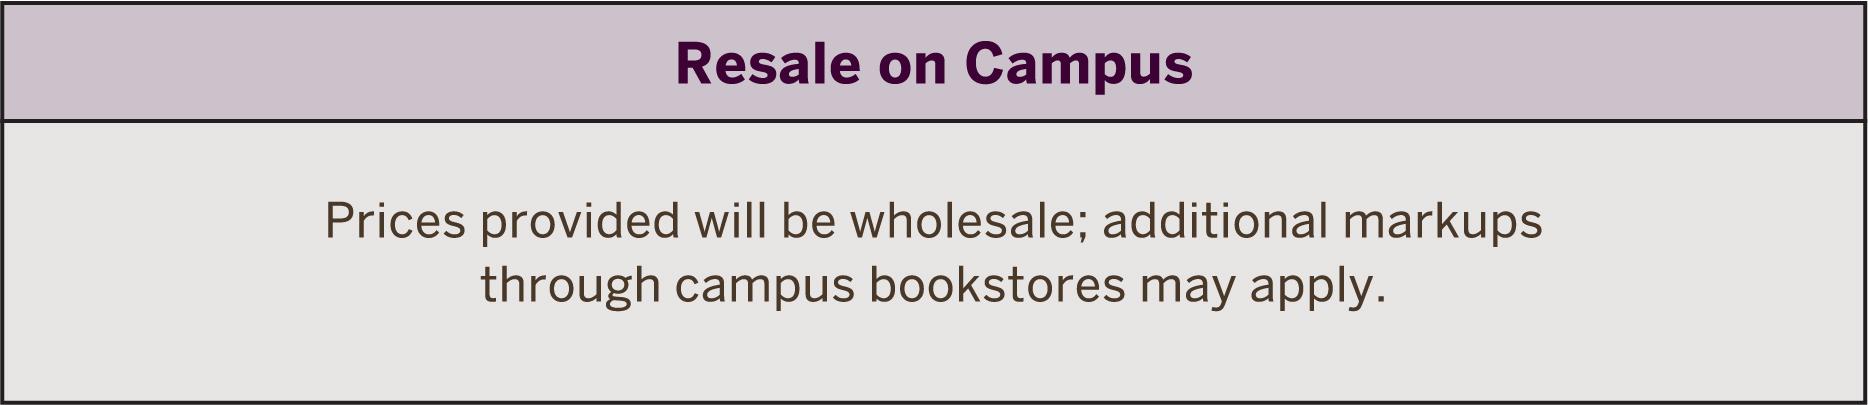 public announcement concerning resale price increase at campus bookstores